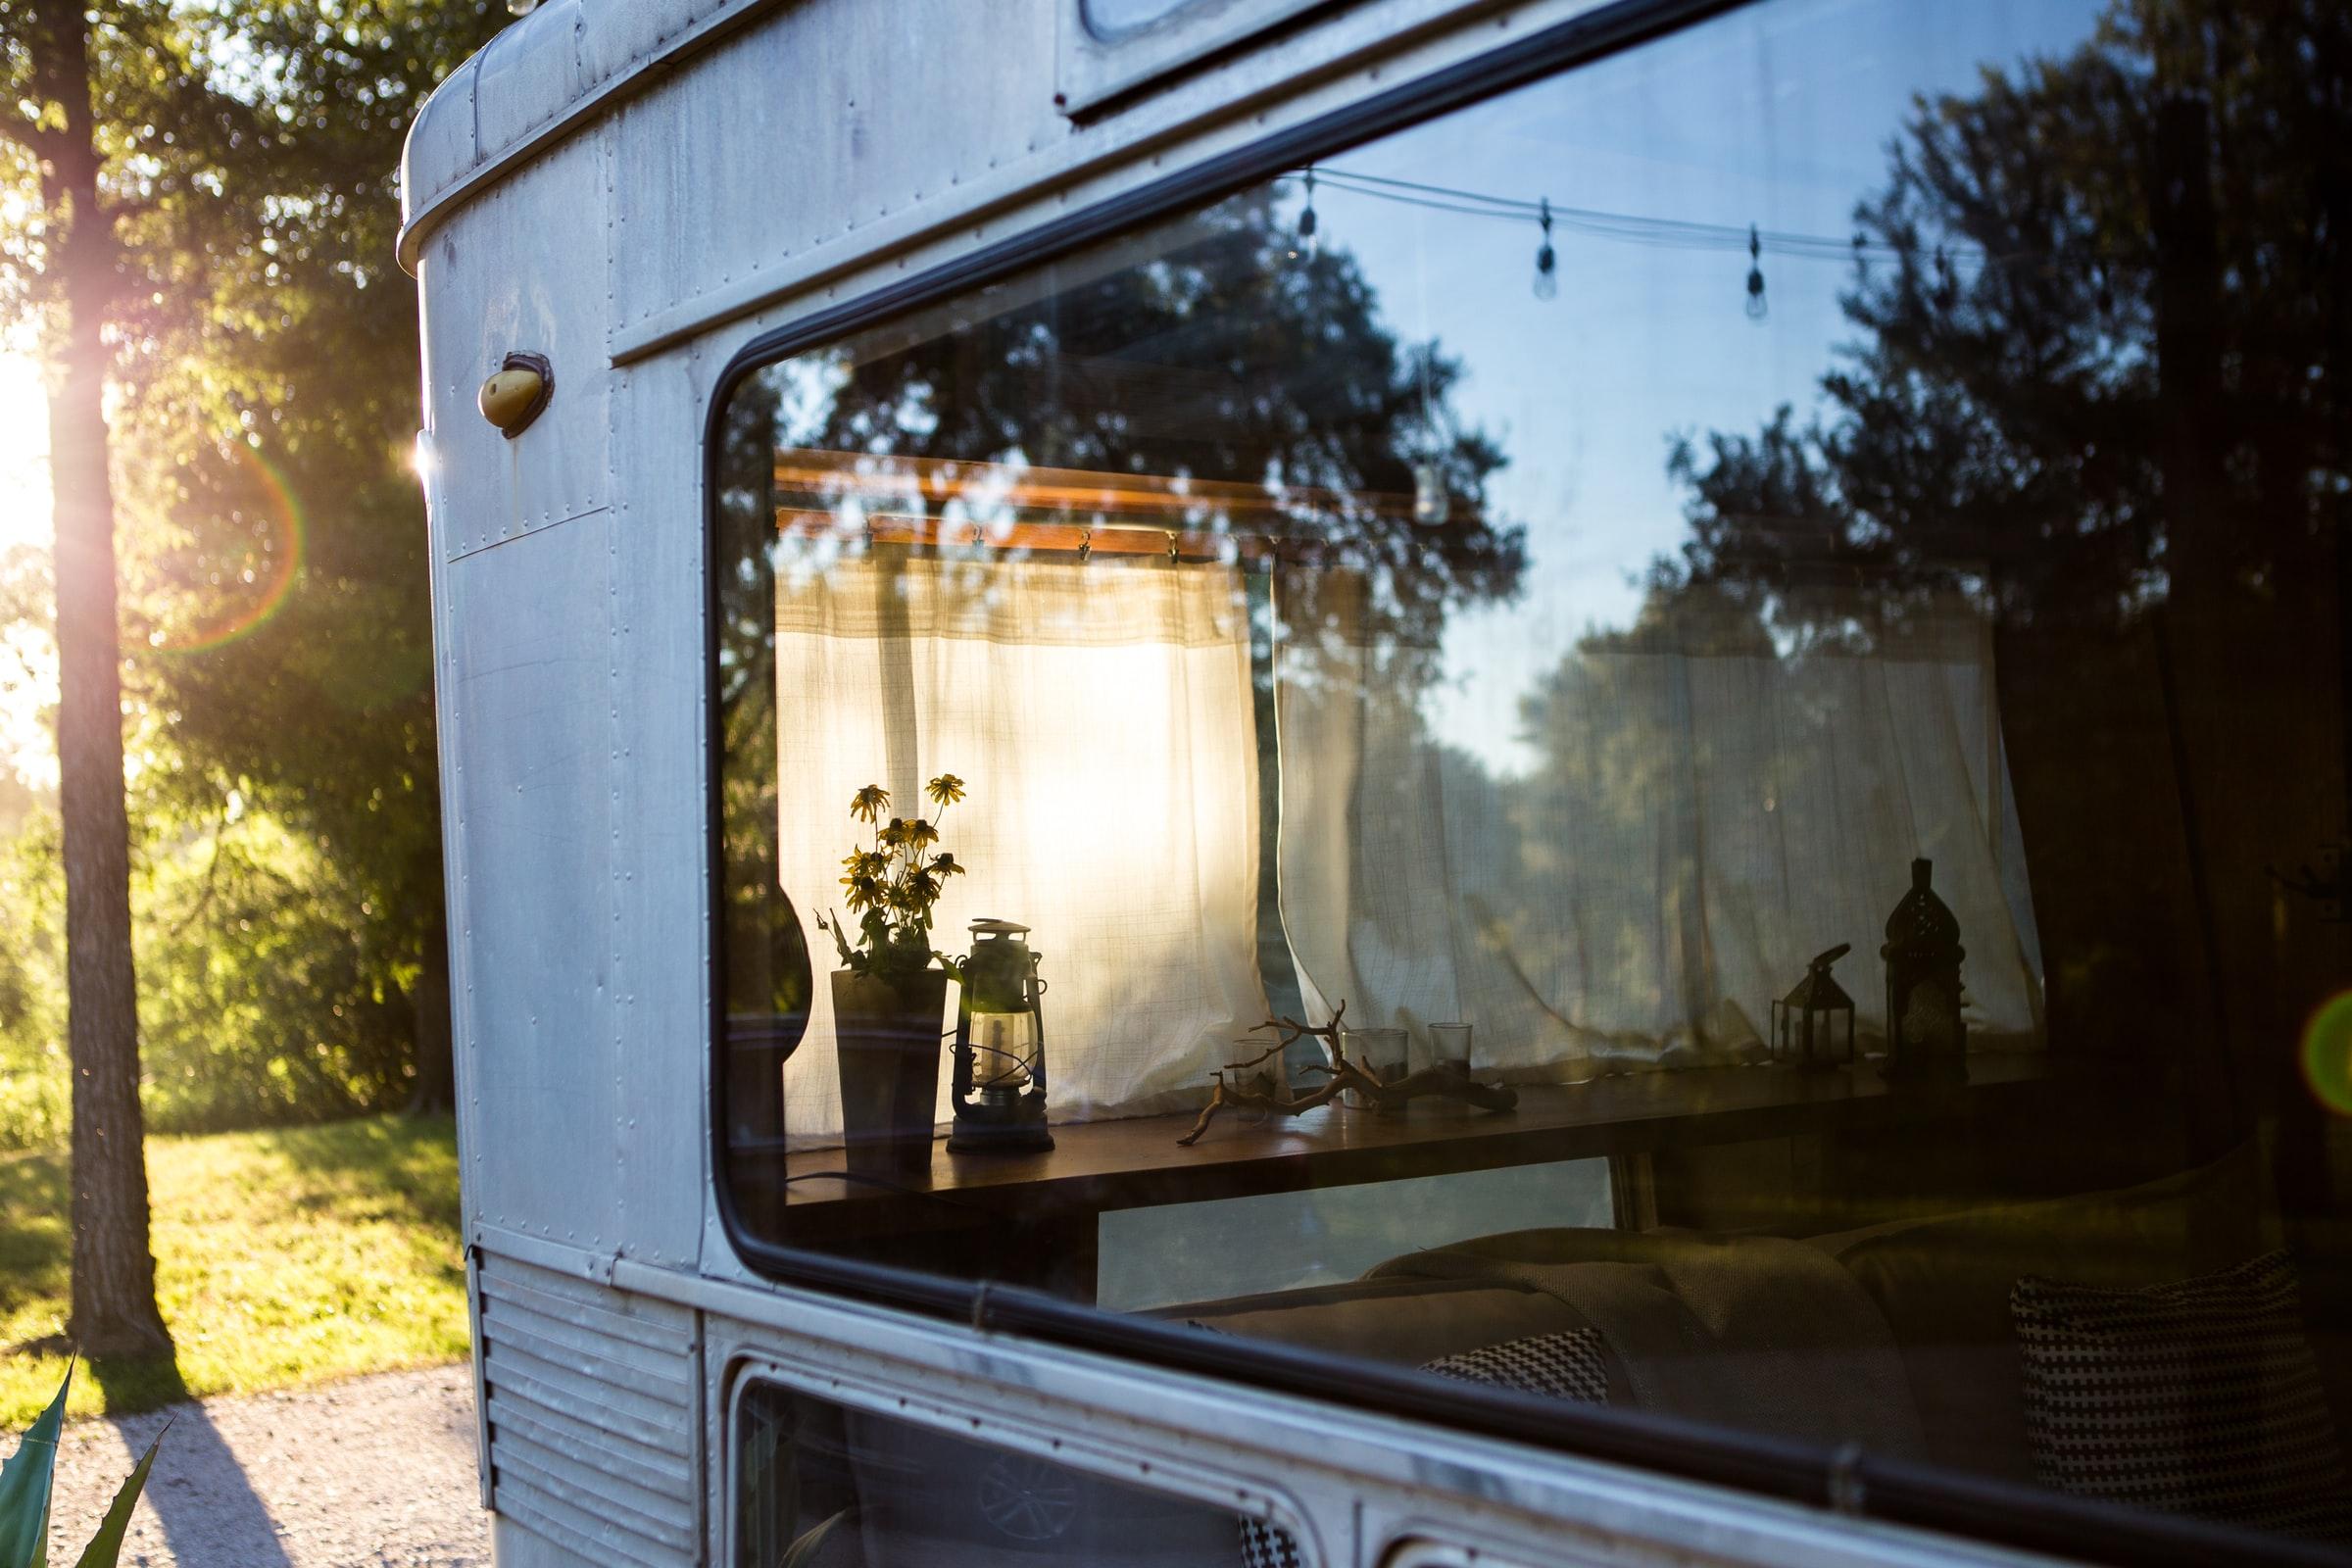 fönster på mobil arbetsvagn